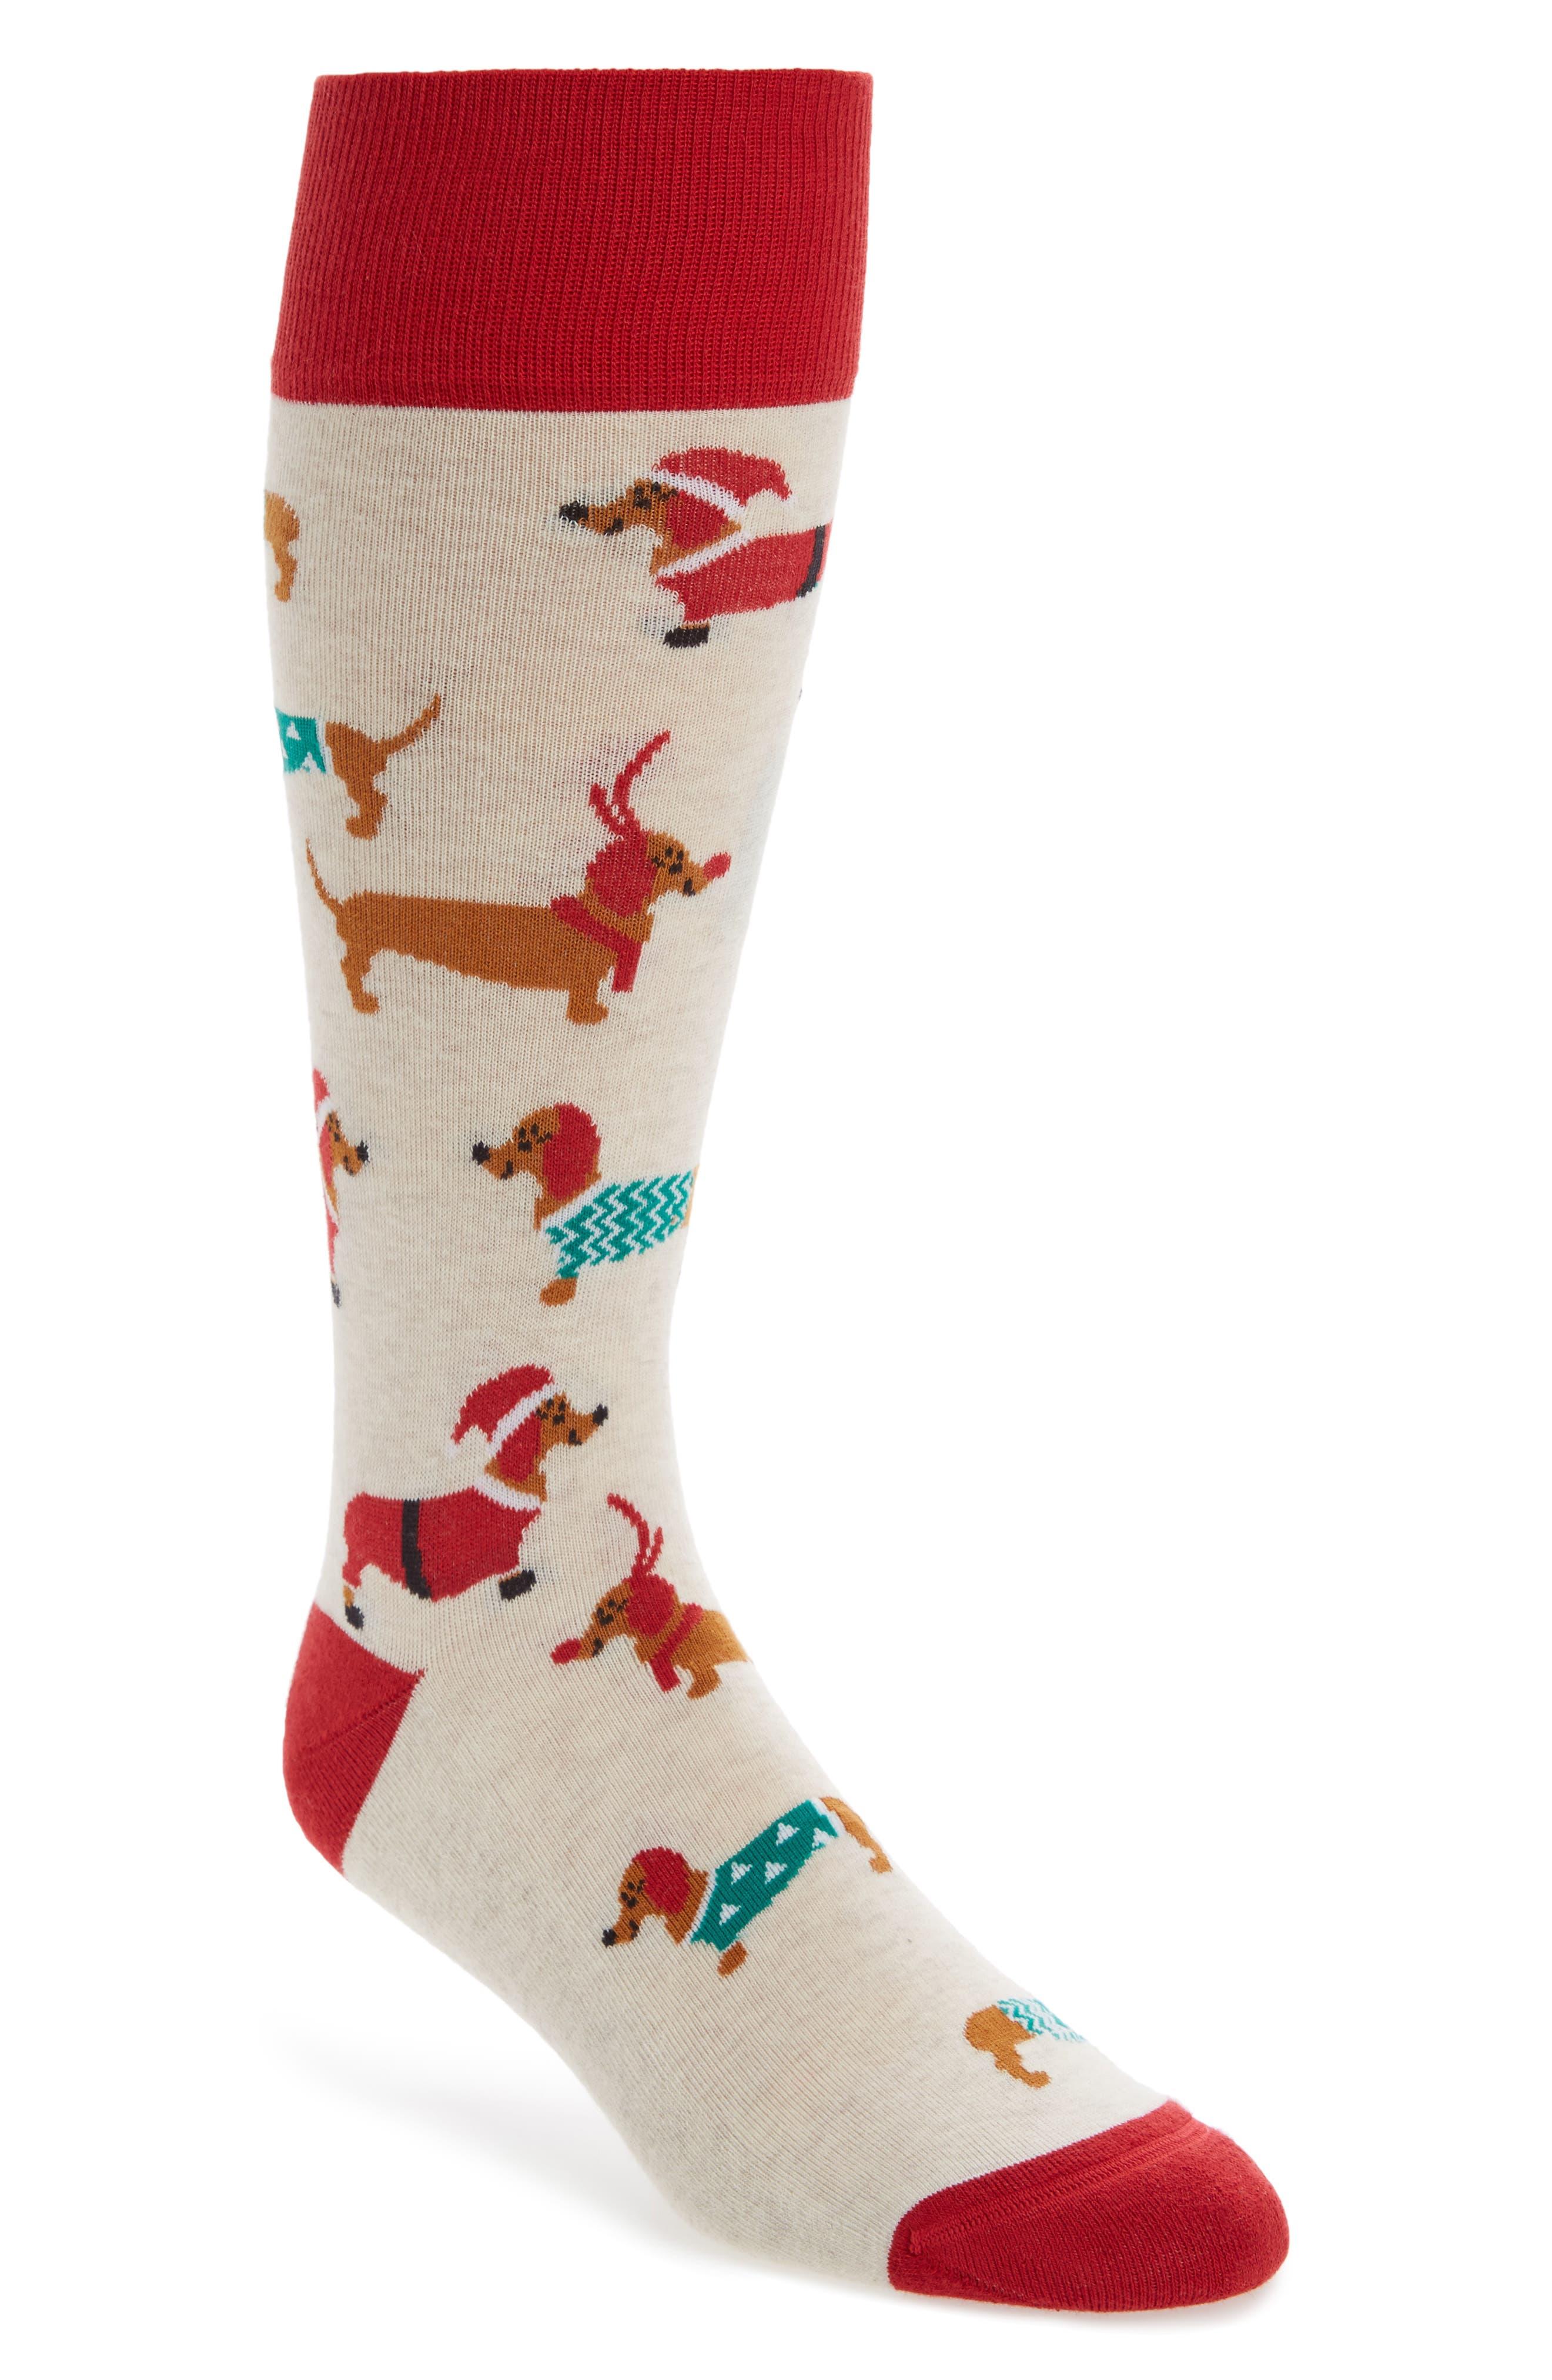 Nordstrom Men's Shop Holiday Dachschund Socks